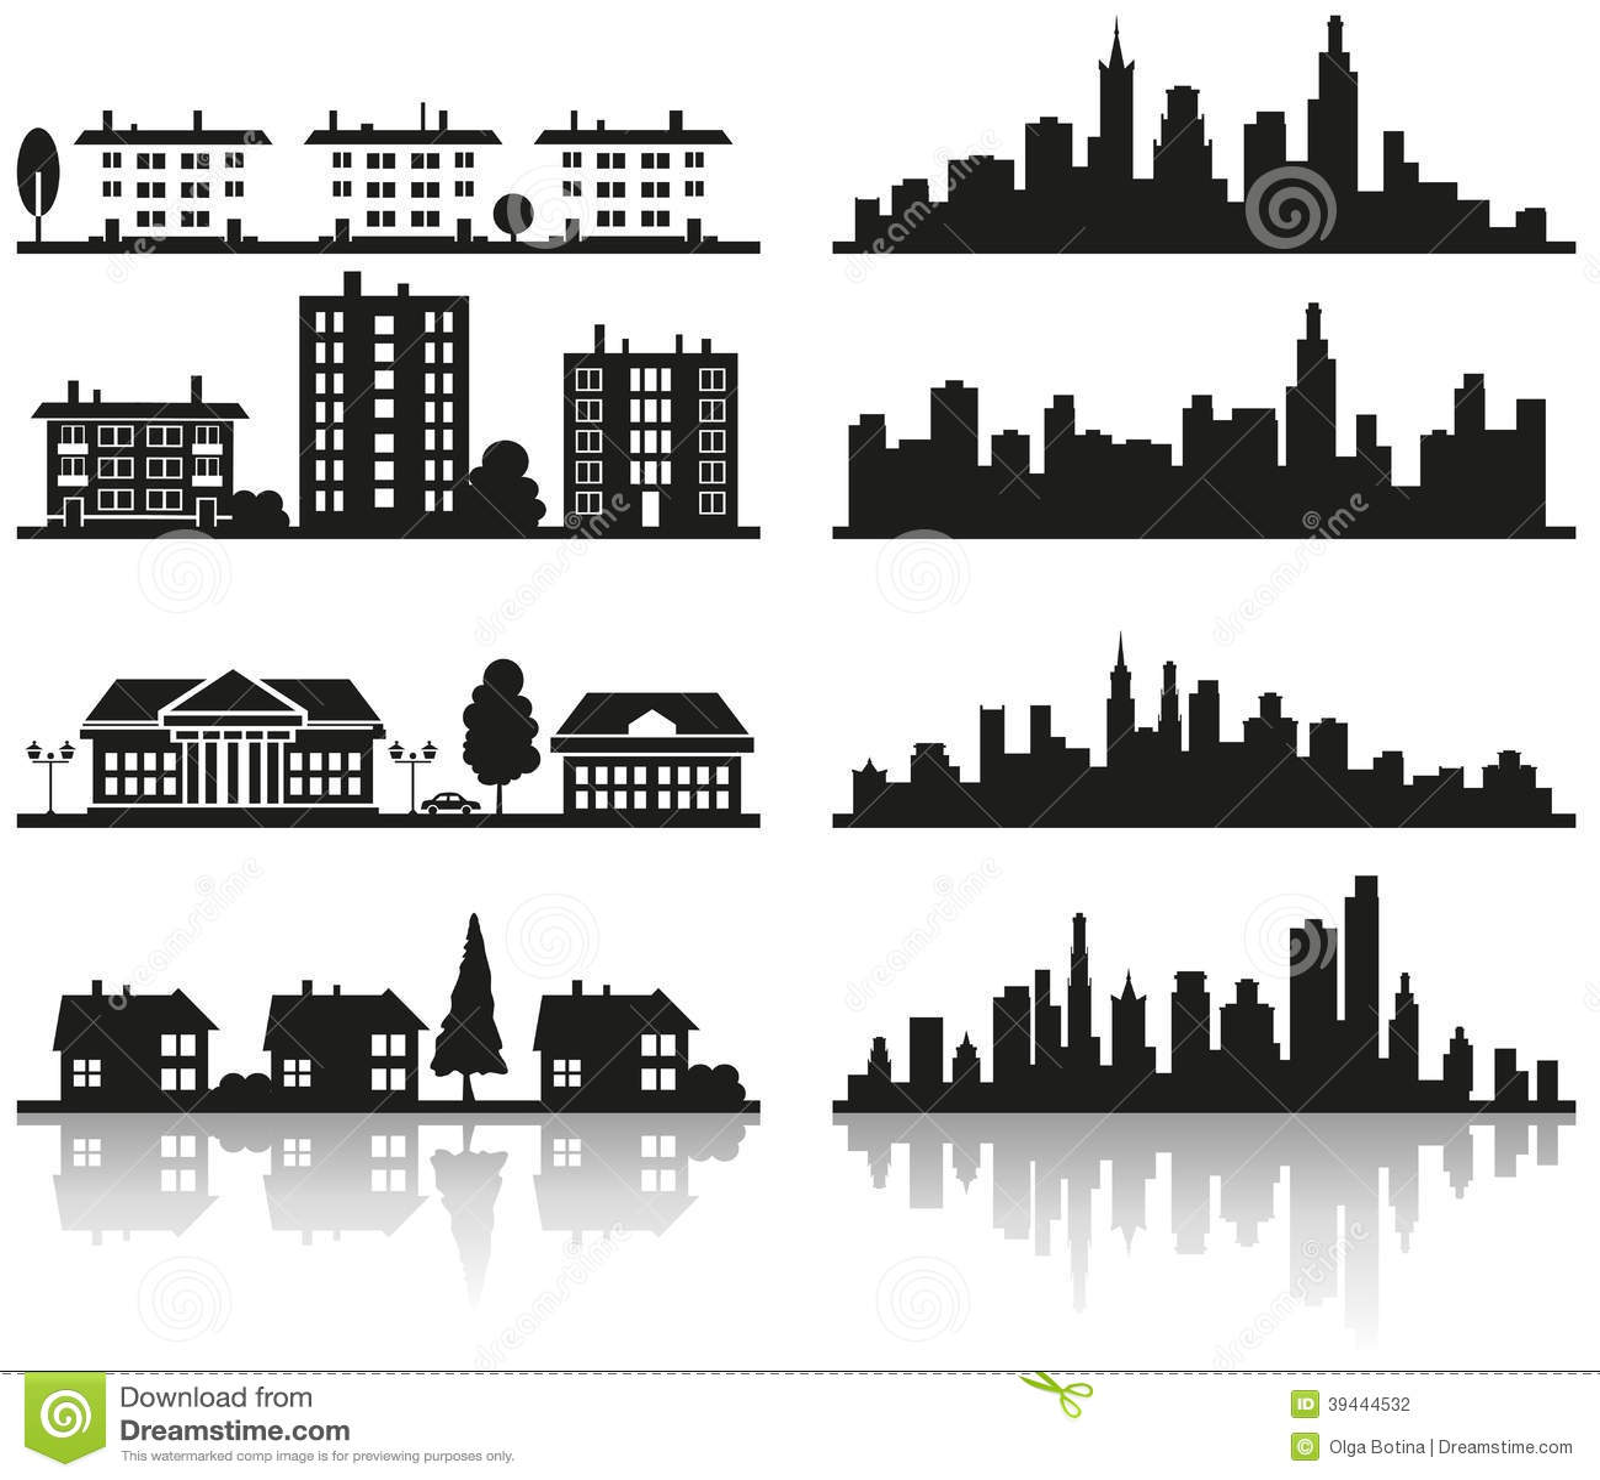 Lille housing